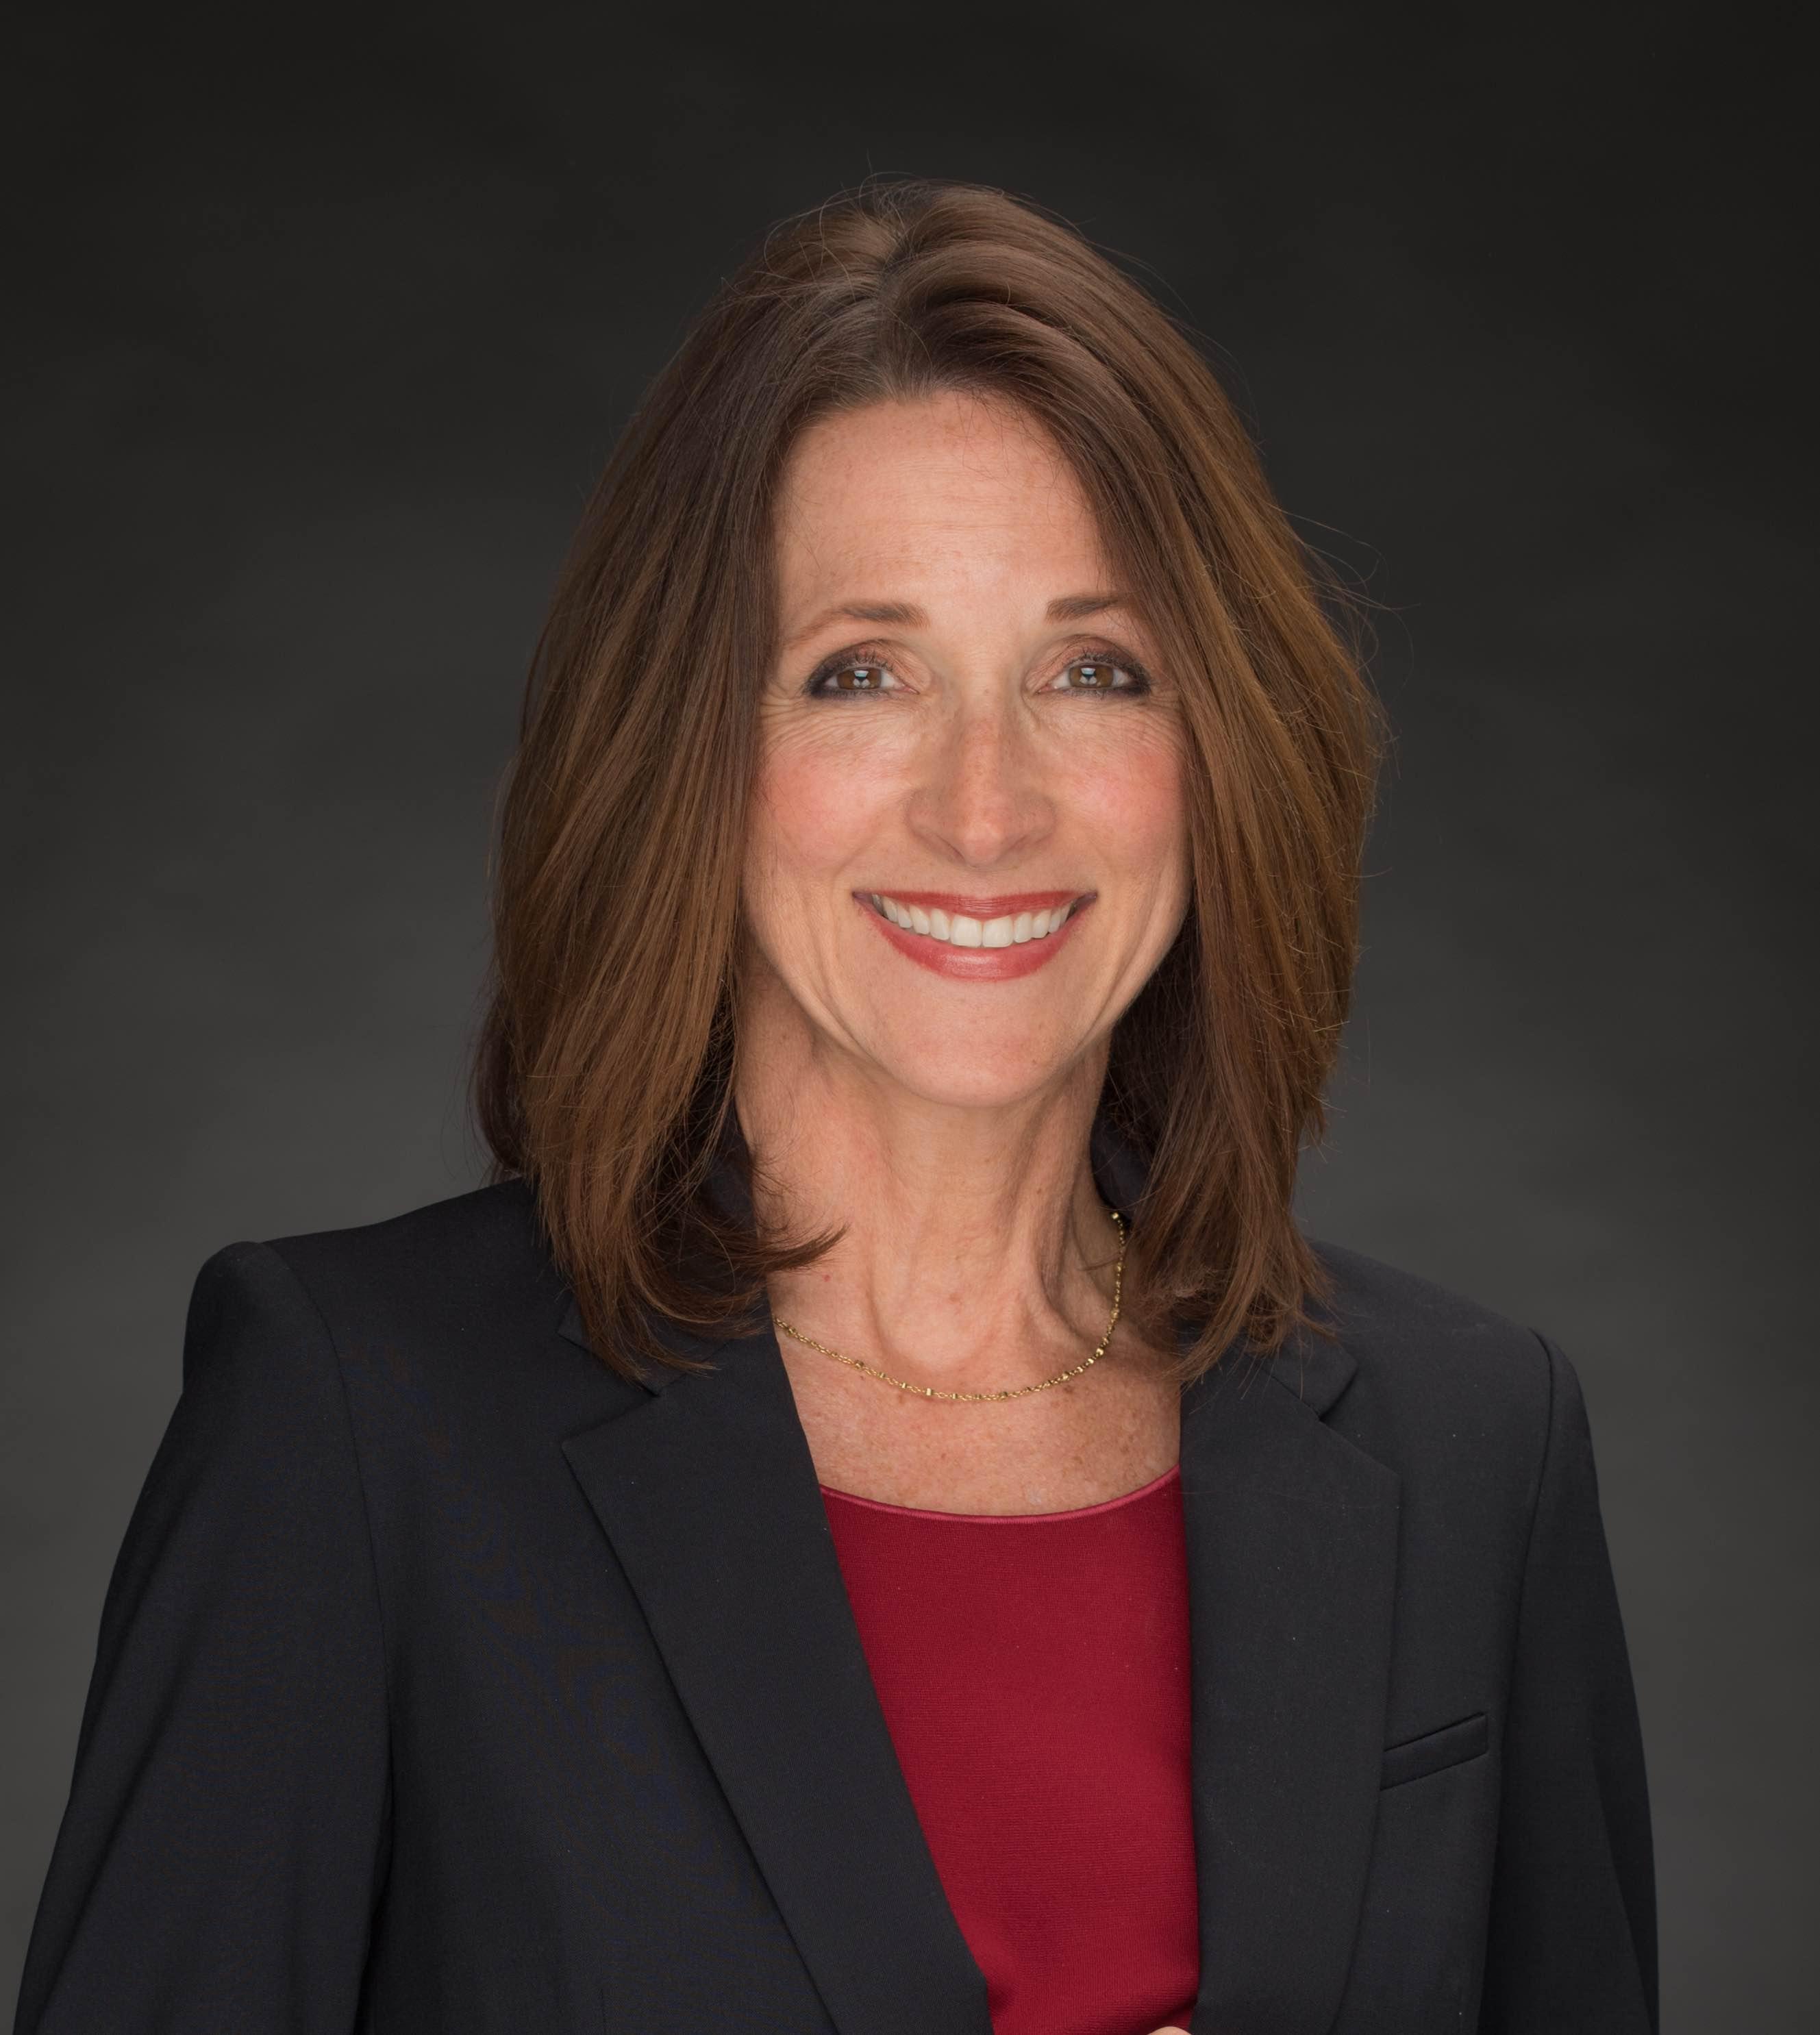 Kathy Mullen